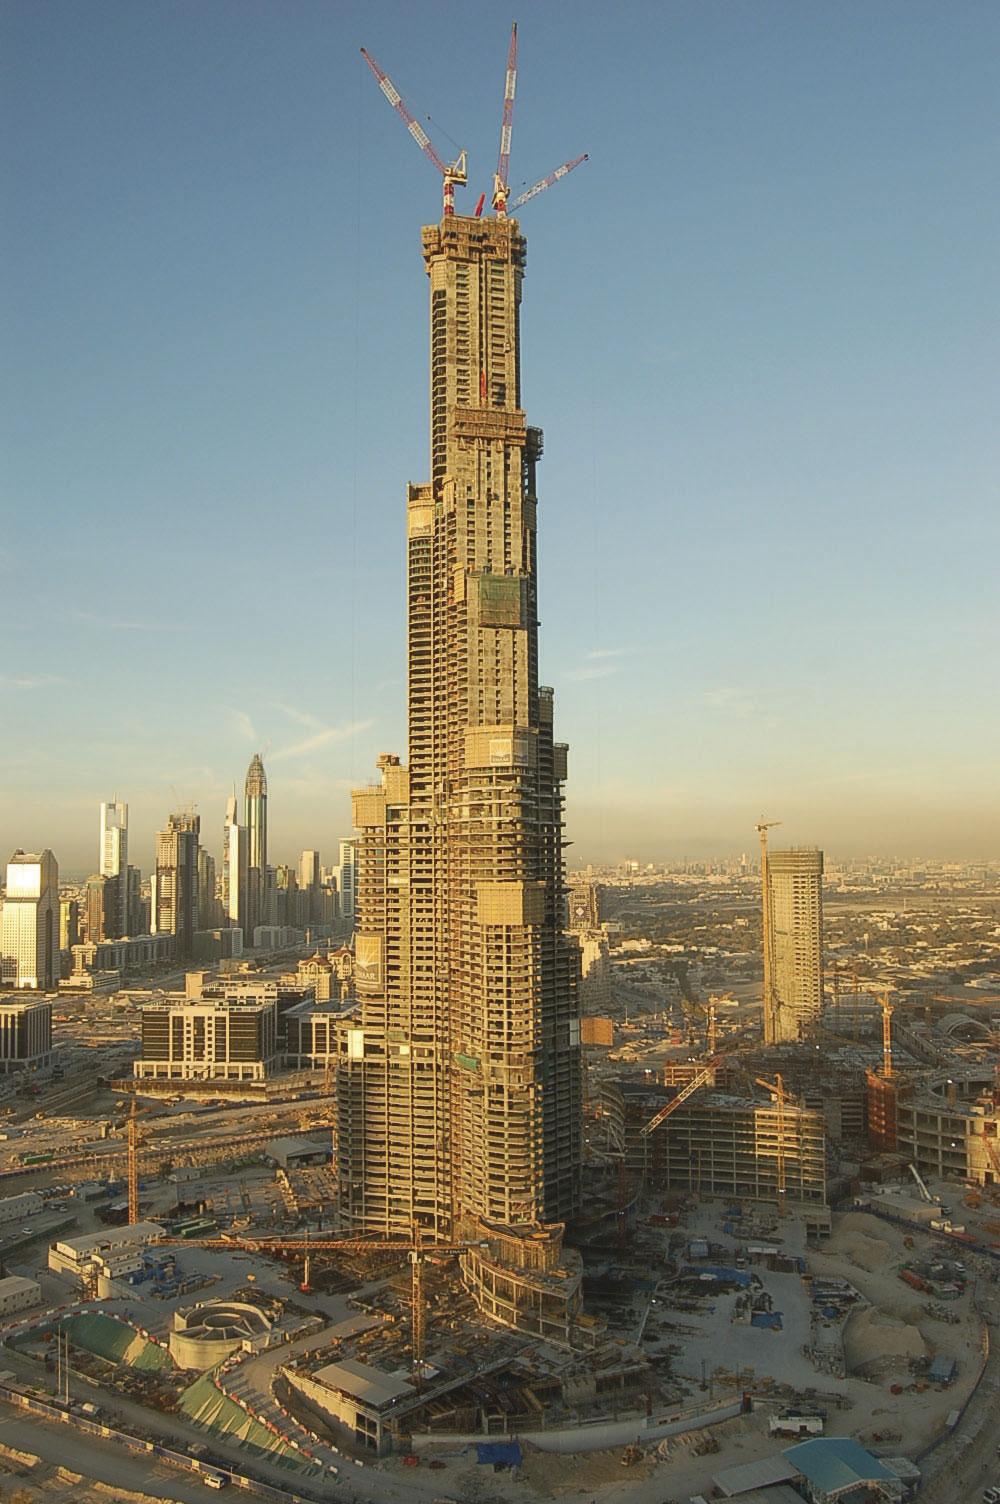 Concrete Pumps Reach Record Breaking Heights At Burj Khalifa